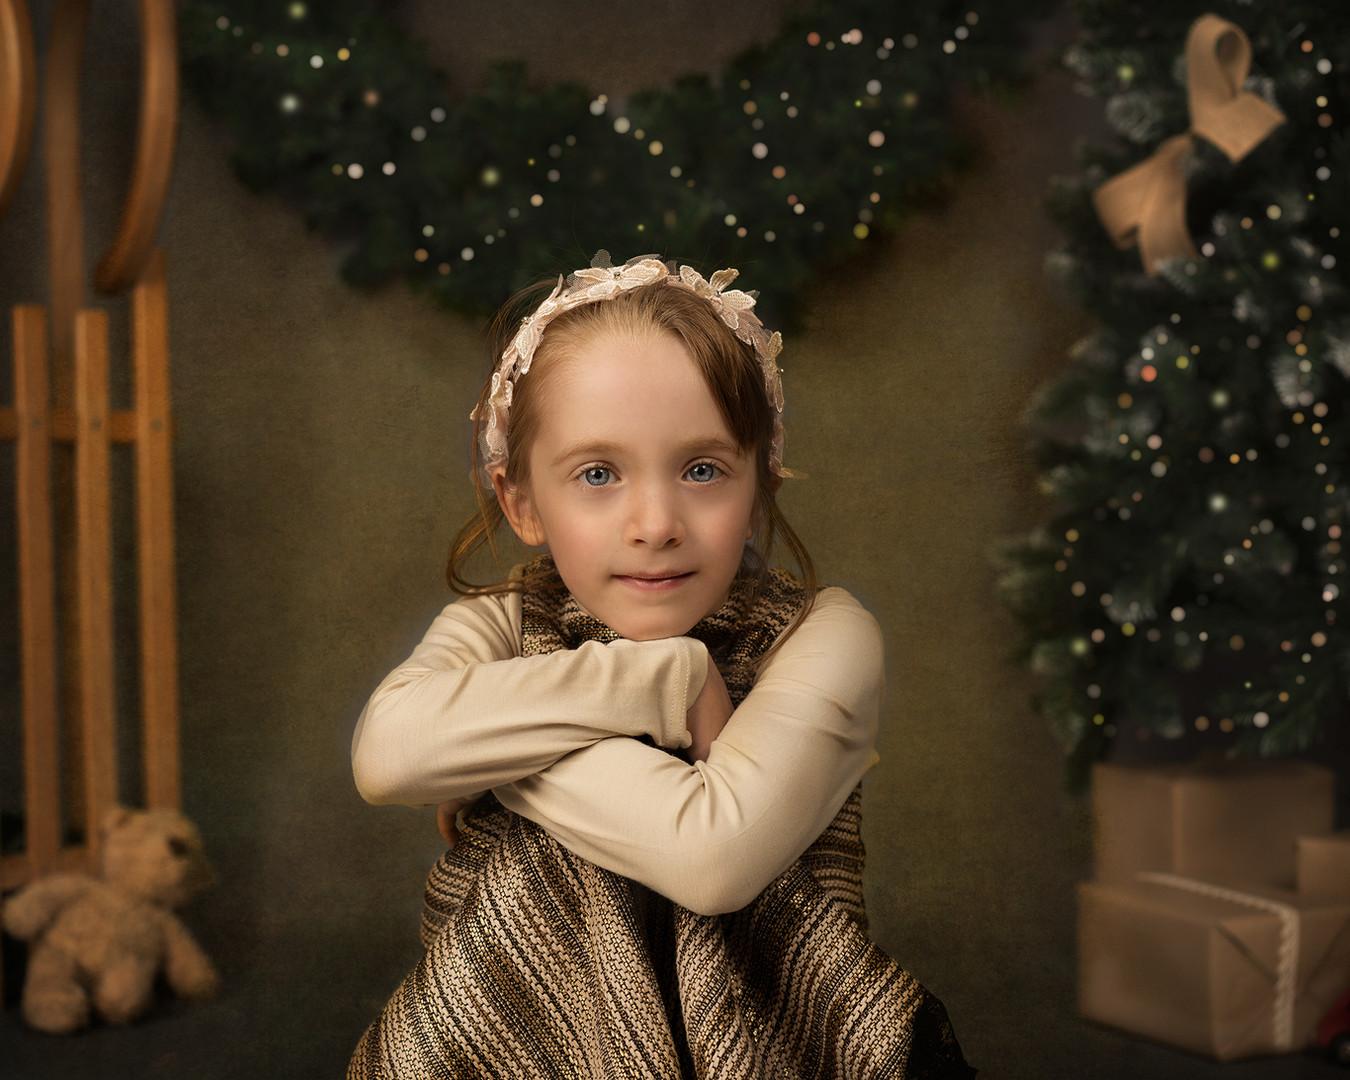 Studijsko fotografiranje za Božić